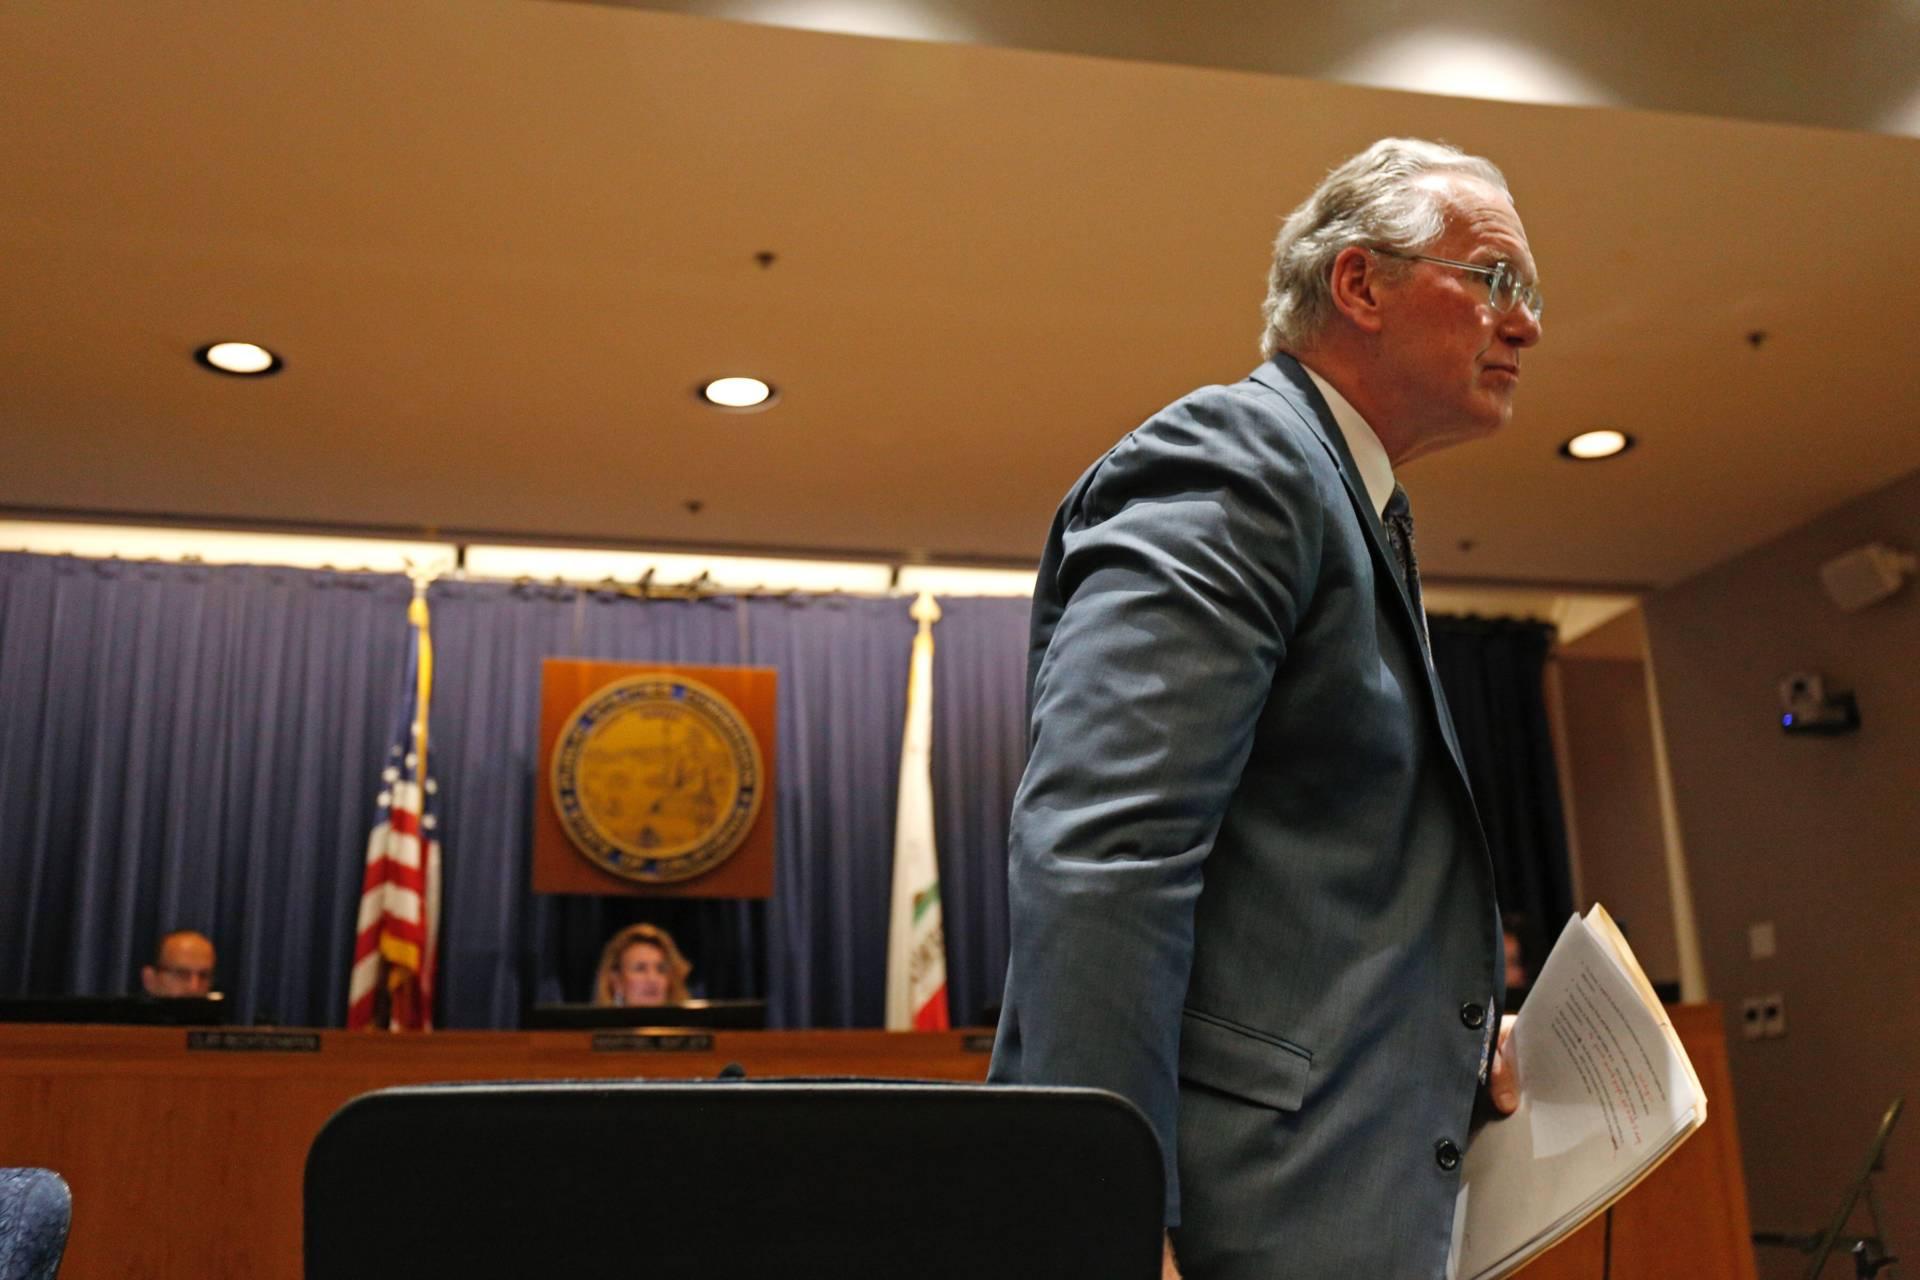 PG&E's CEO: Power Shutoffs Were 'Surgical'